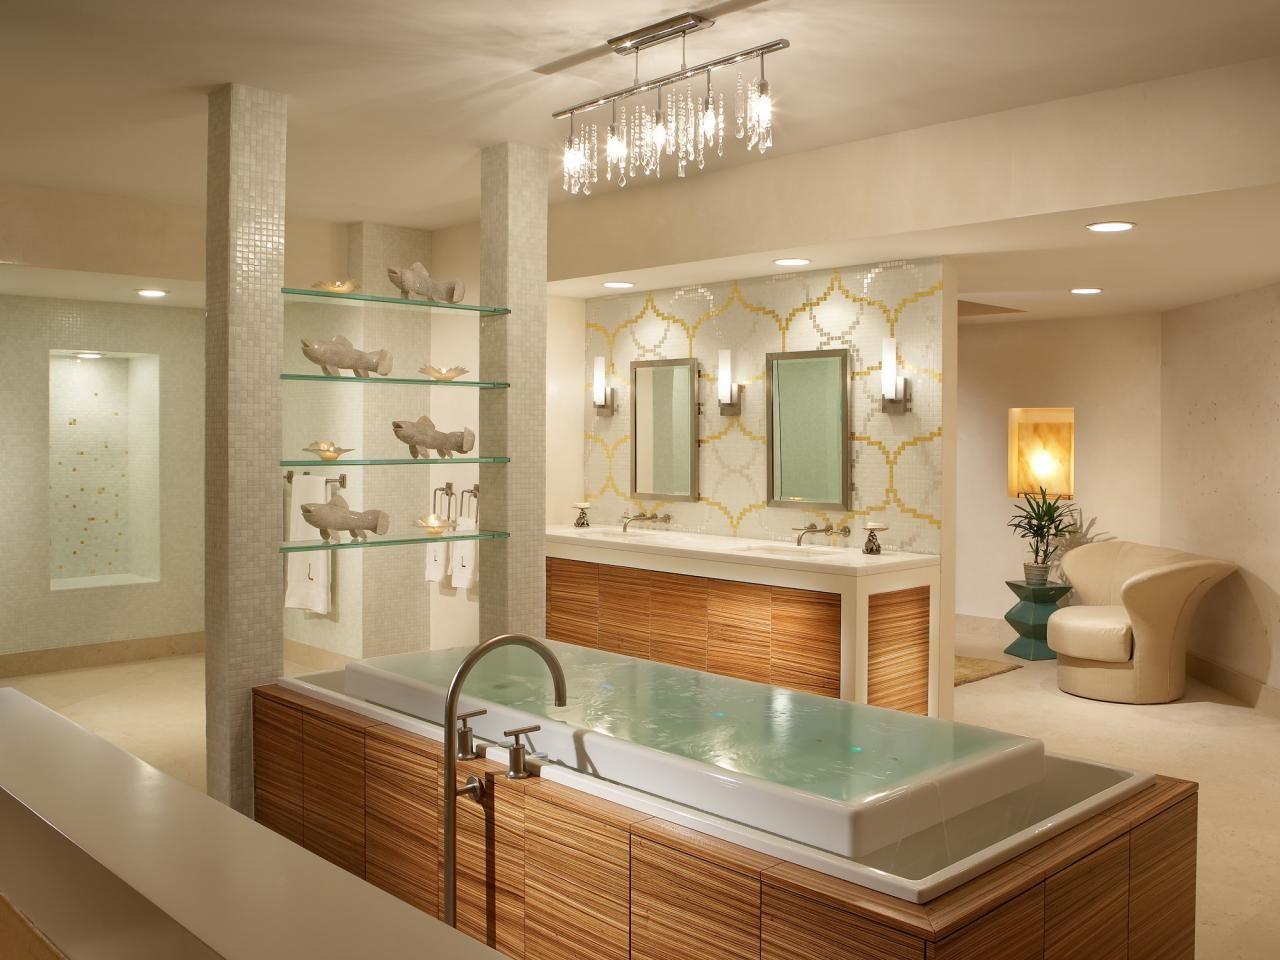 10 Budget Friendly Ideas for Your Bathroom